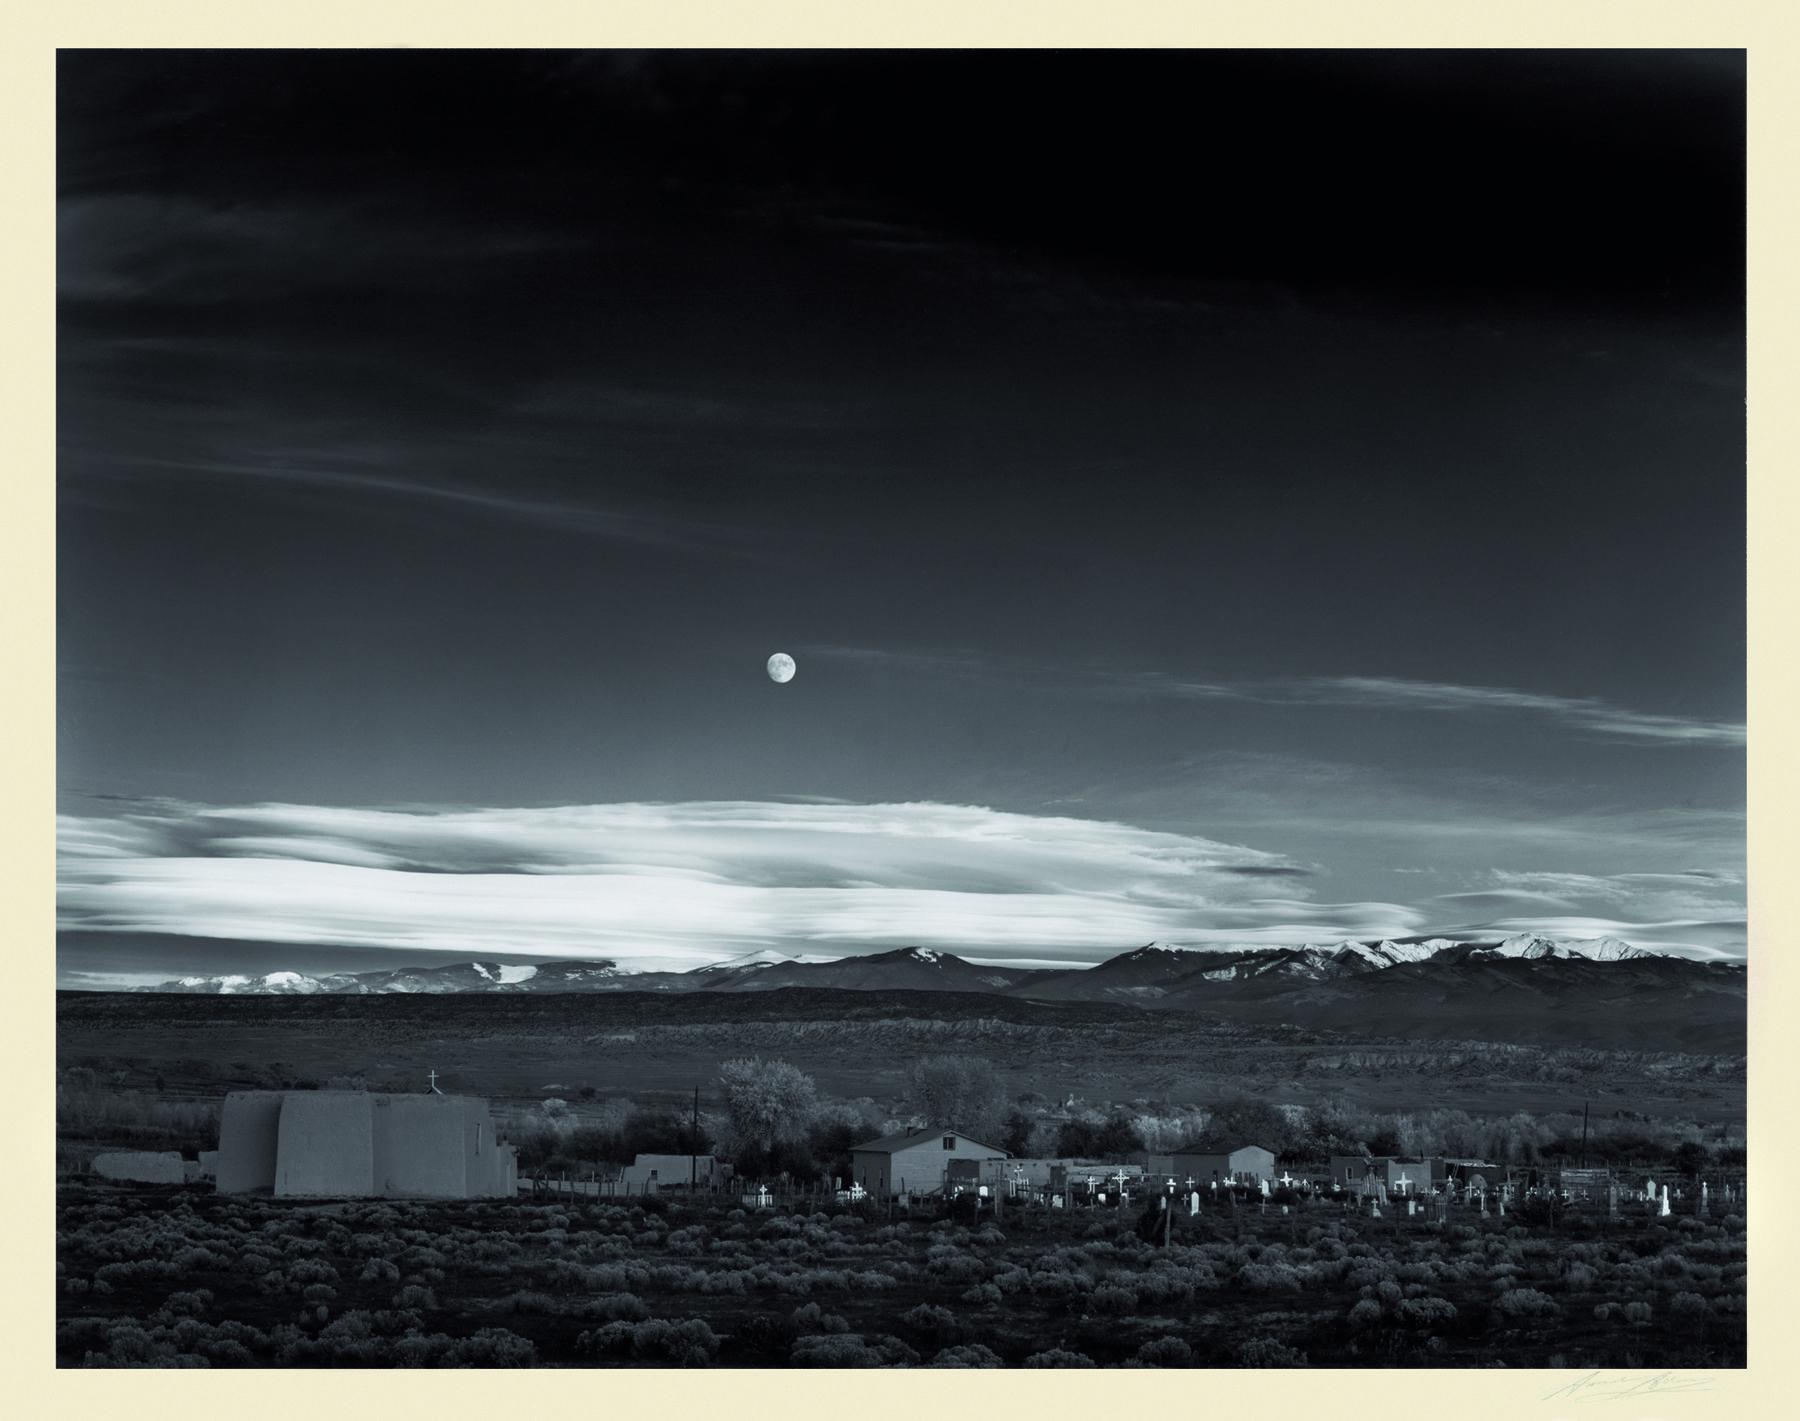 ansel adams moonrise hernandez new mexico